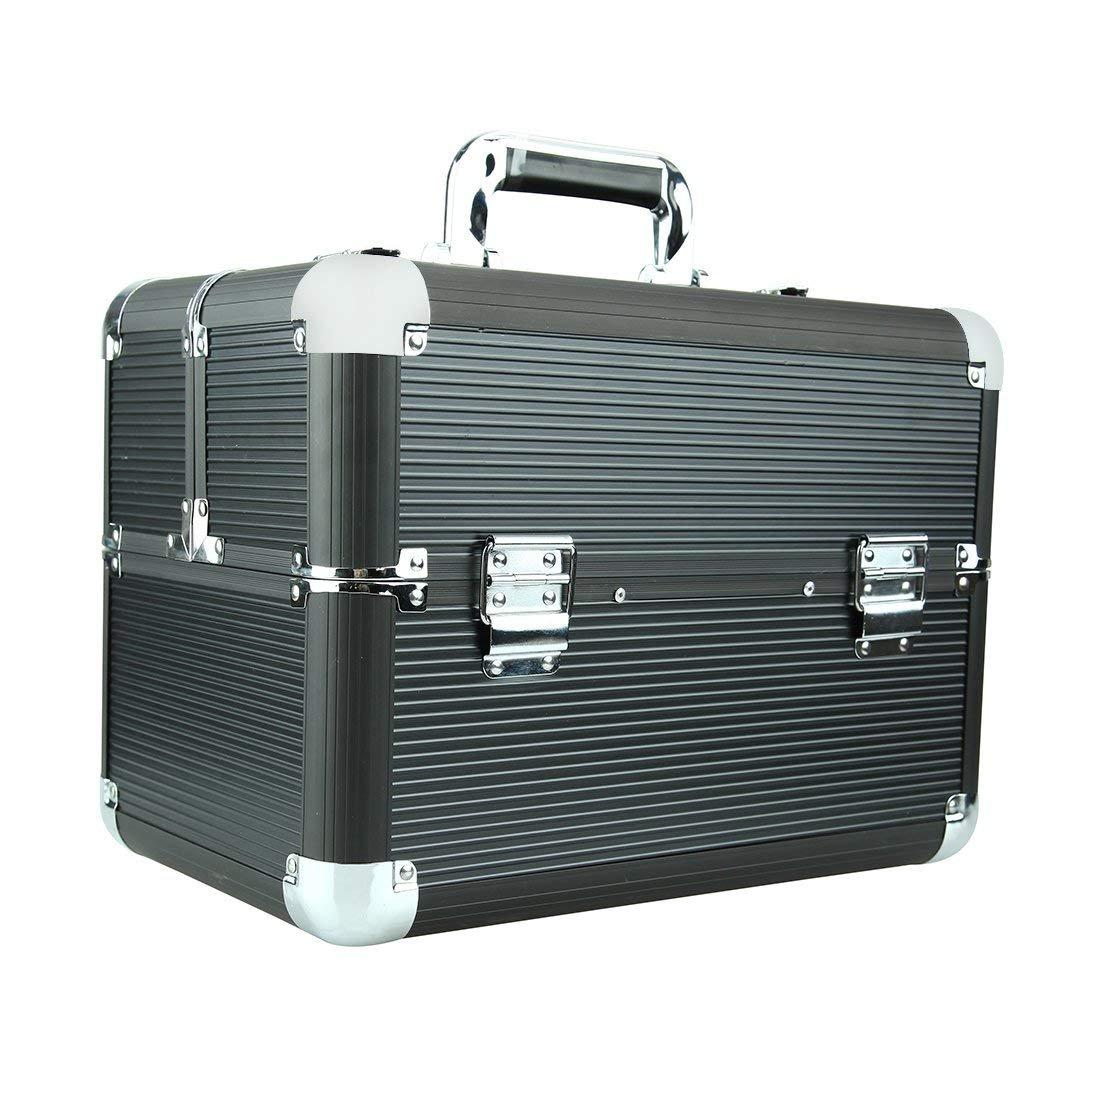 Makeup Train Cases Professional Large Make Up Boxes Artist Organizer Kit Makeup Cases Black Saint. Bos